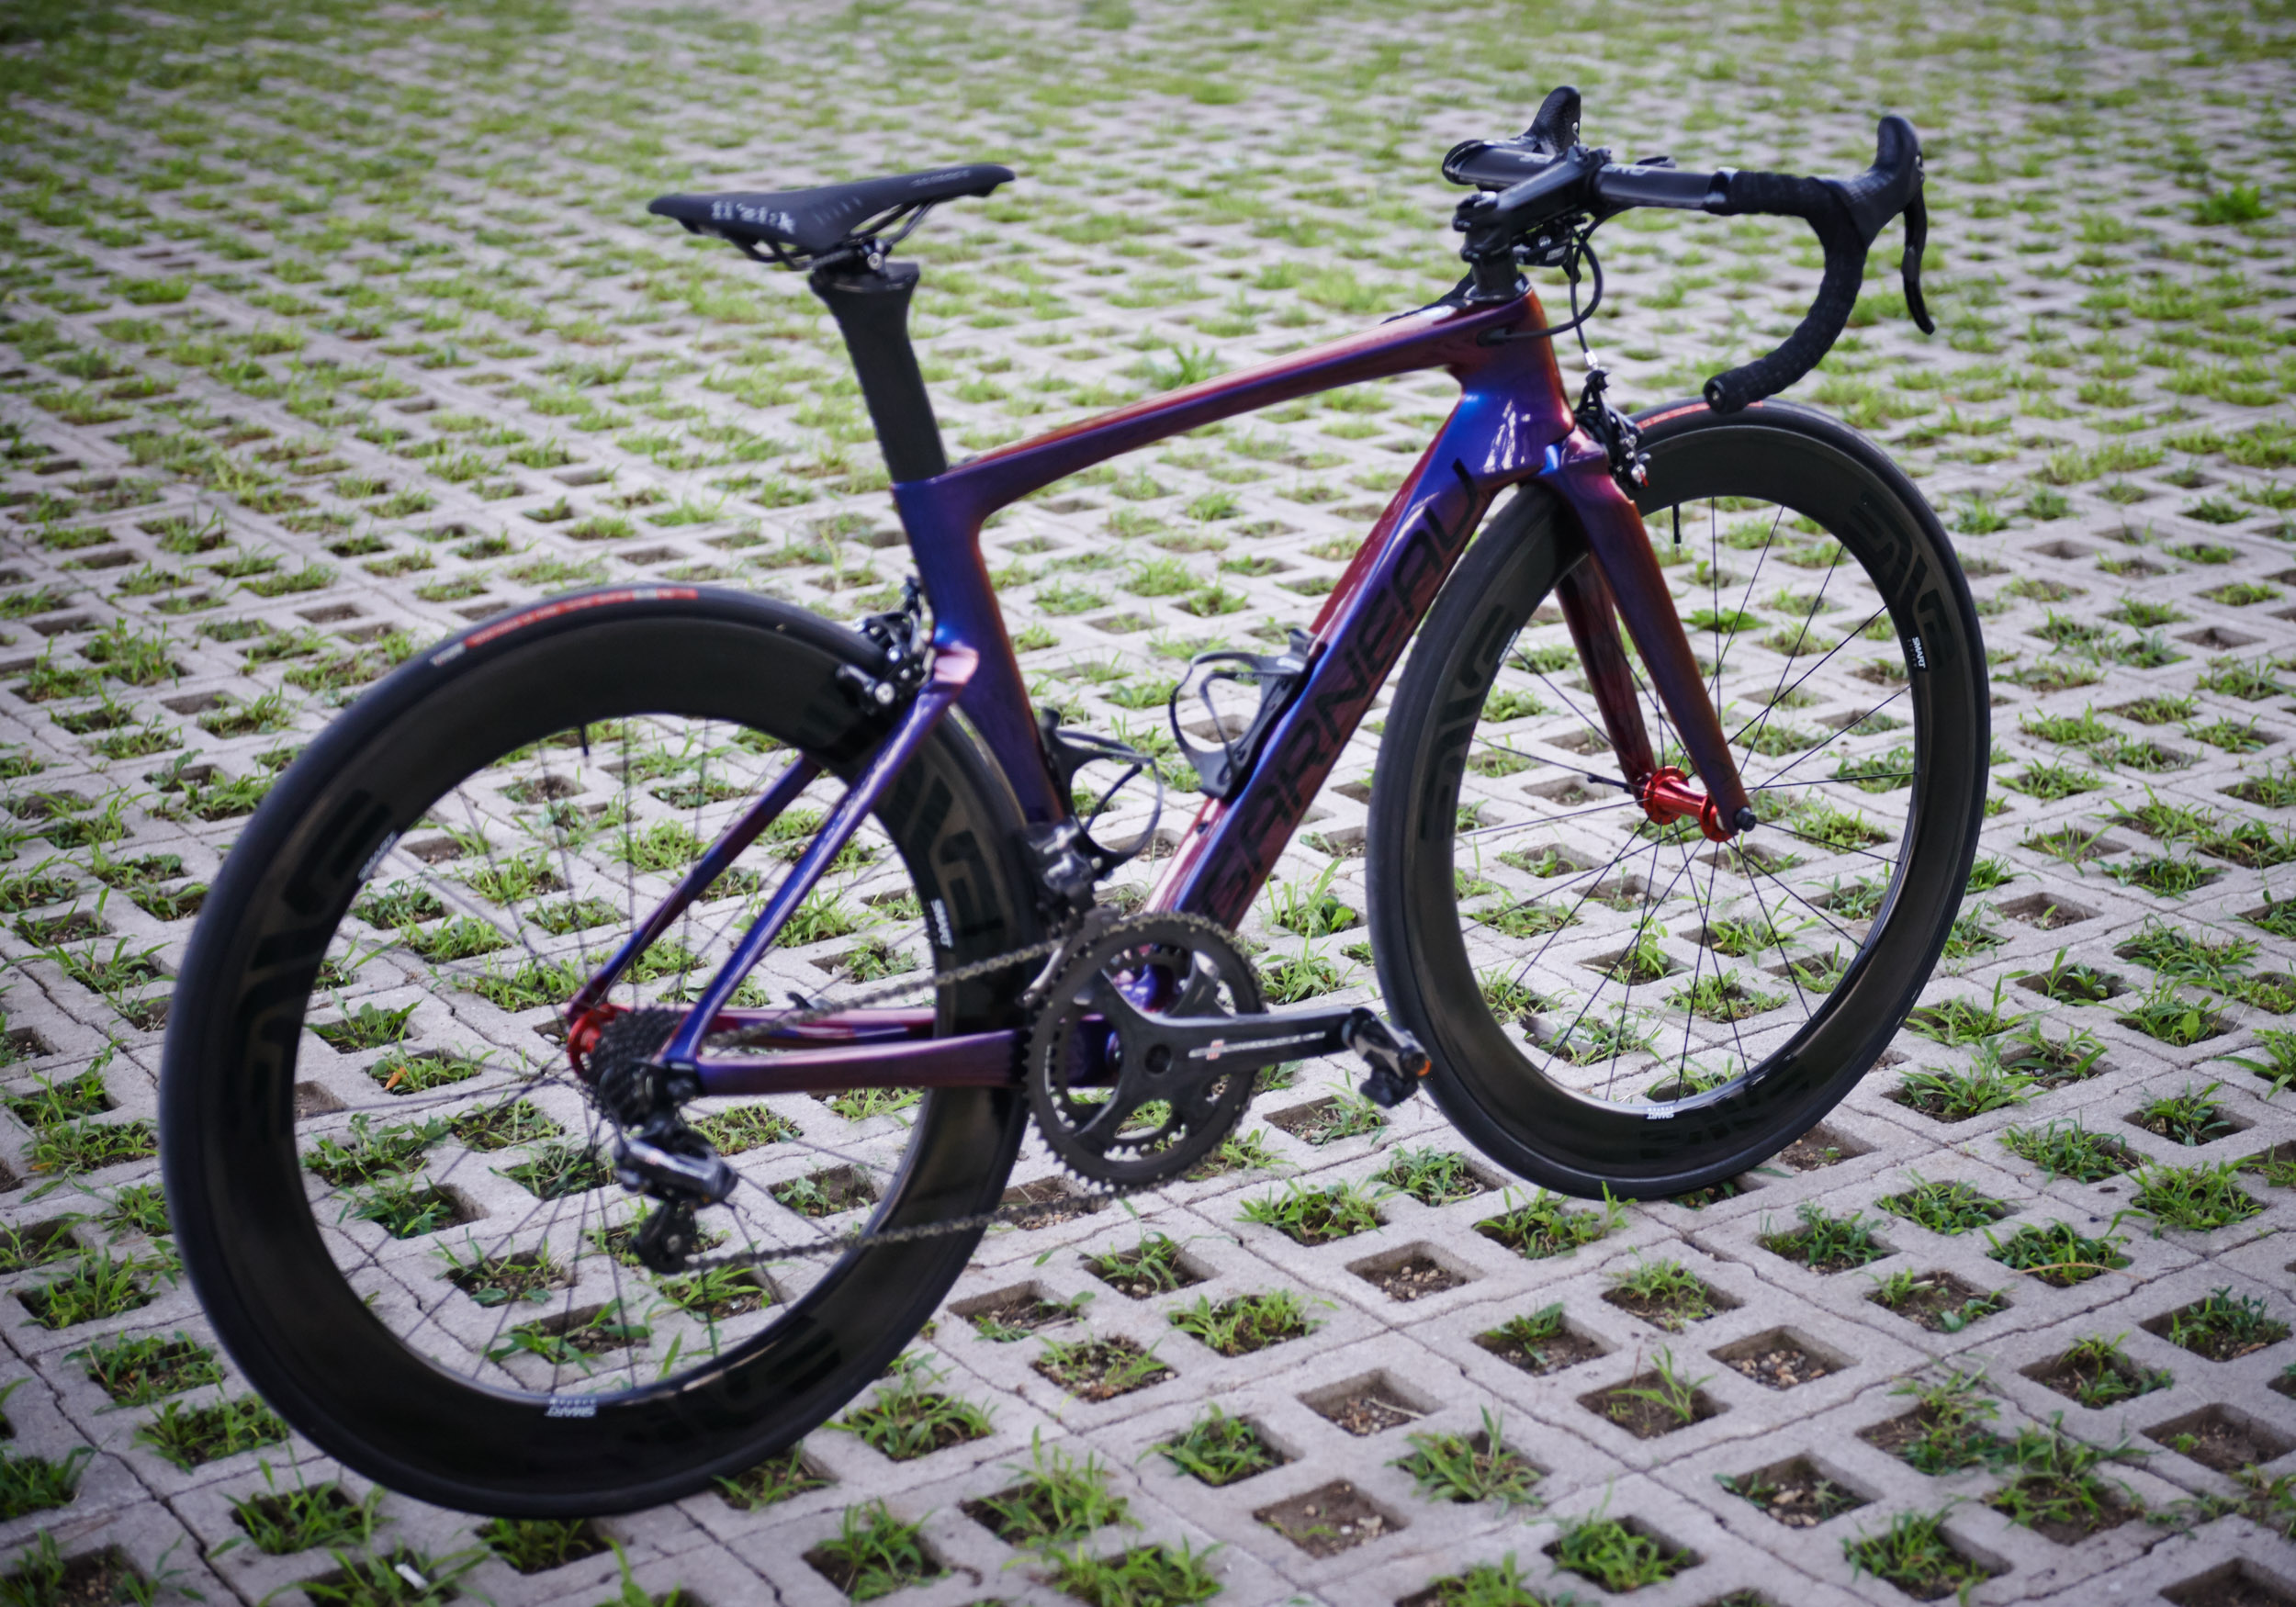 to-be-determined-garneau-a1-bike-review-123.jpg